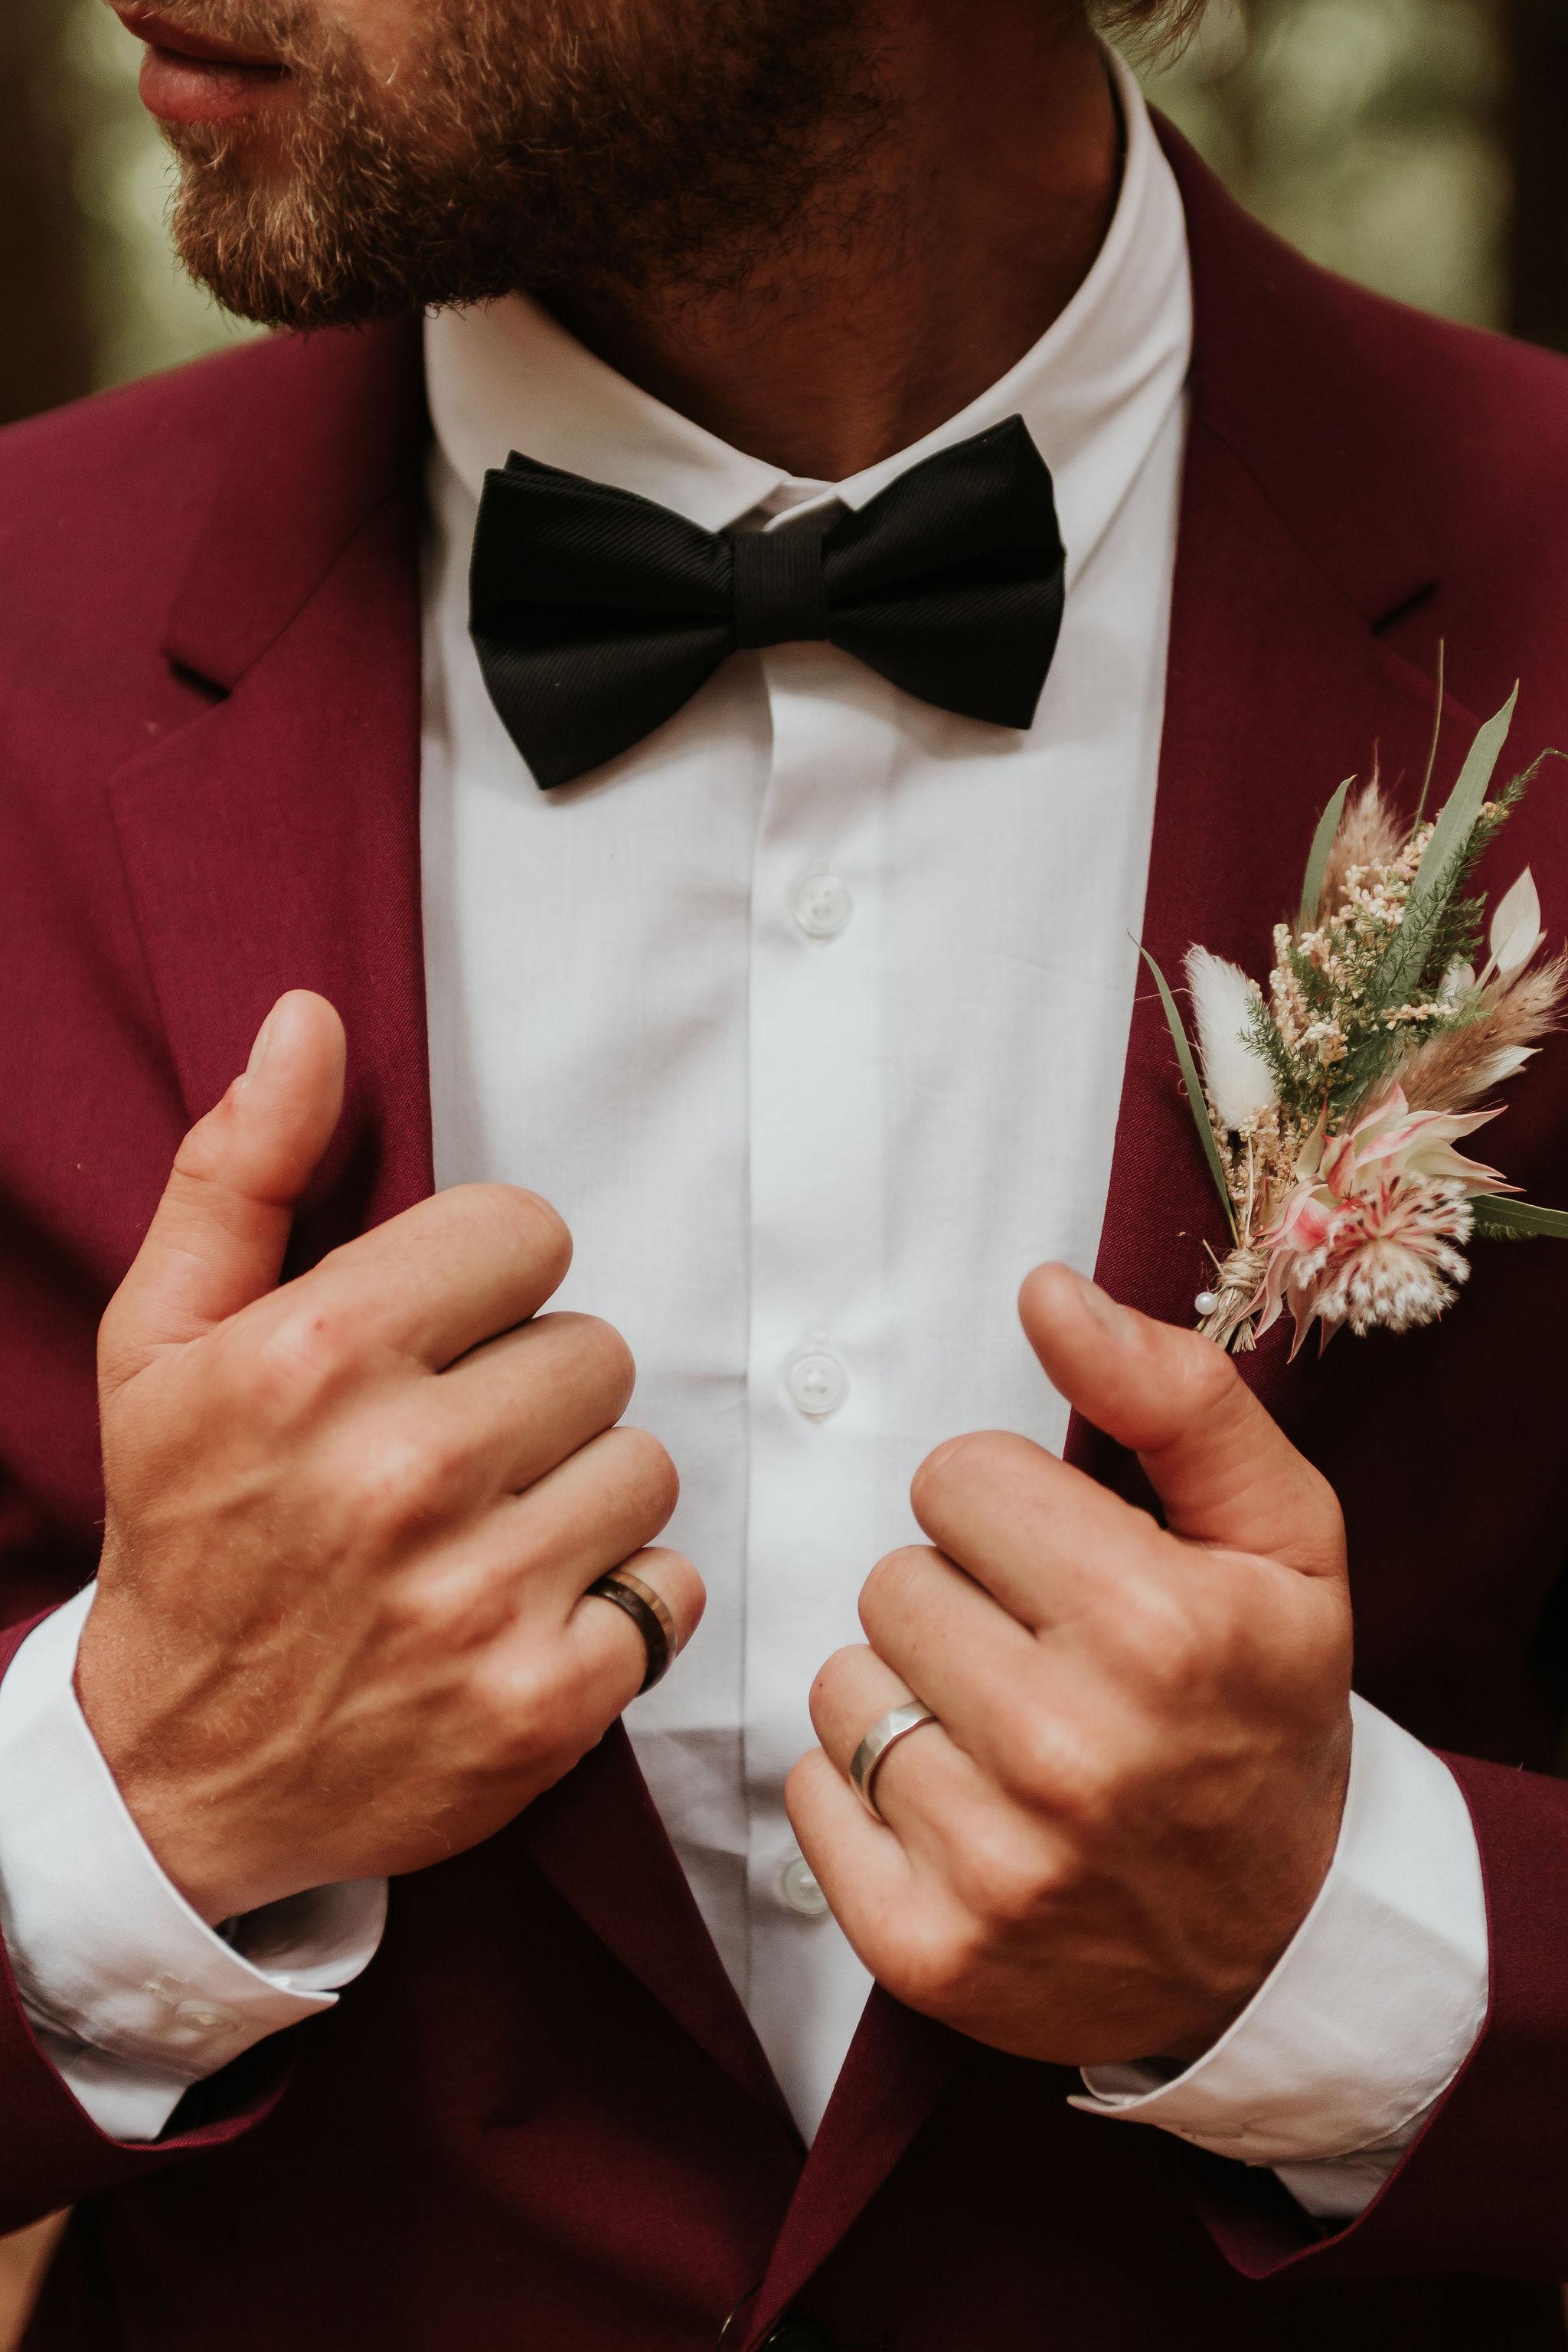 mens burgundy suit and black bowtie - unique groomswear - alternative grooms wear